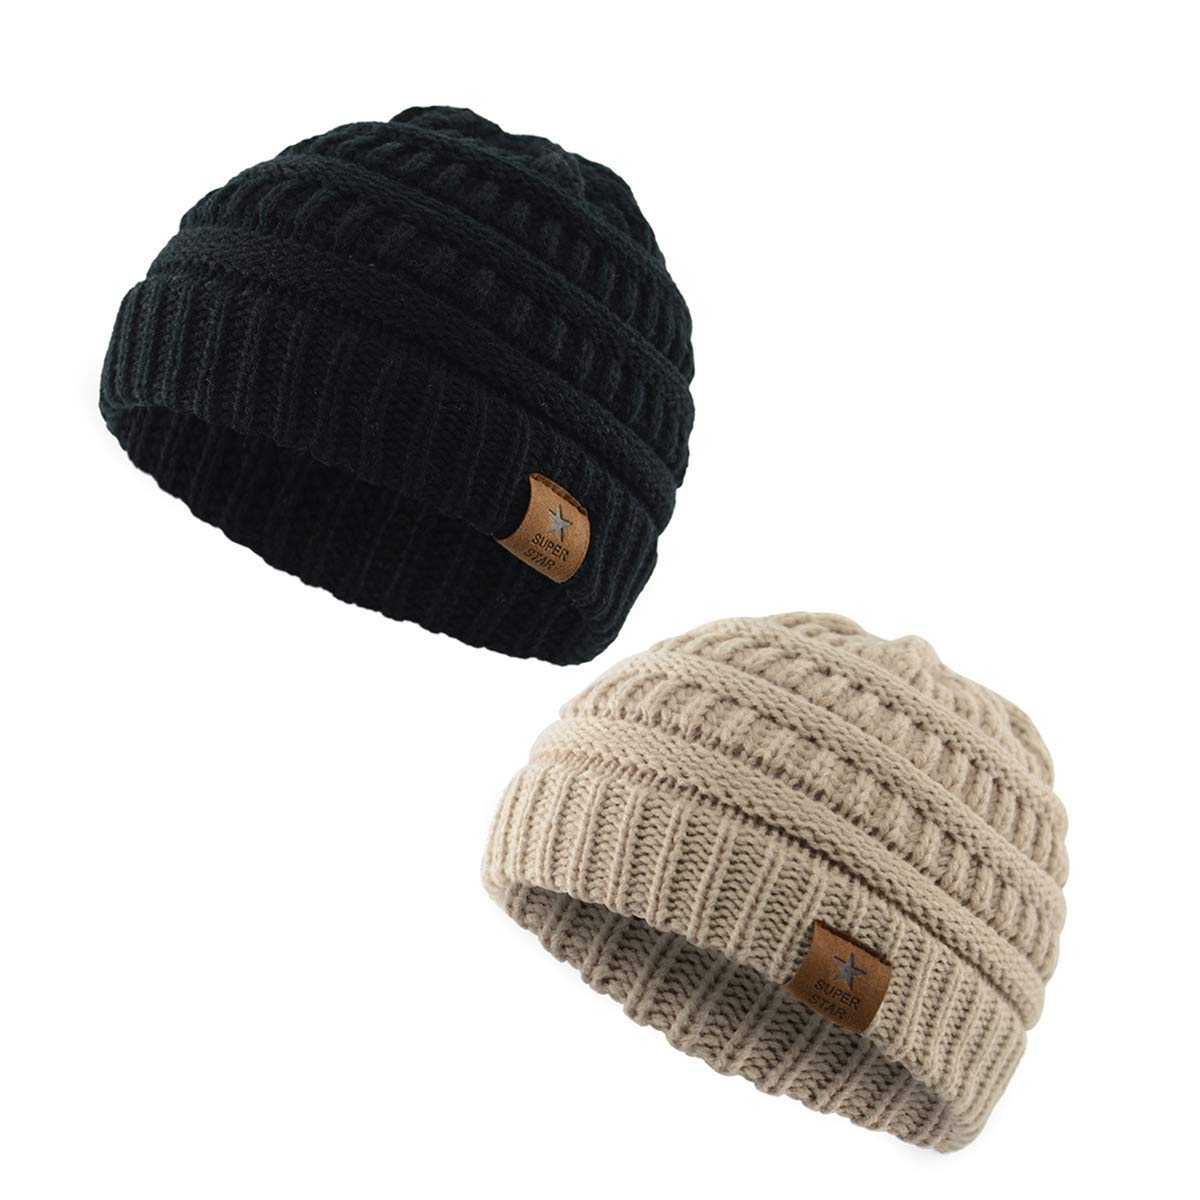 c98442343c0 Get Quotations · Baby Kids Knit Winter Warm Hats Boy Girl Infant Toddler  Children s Beanie Caps